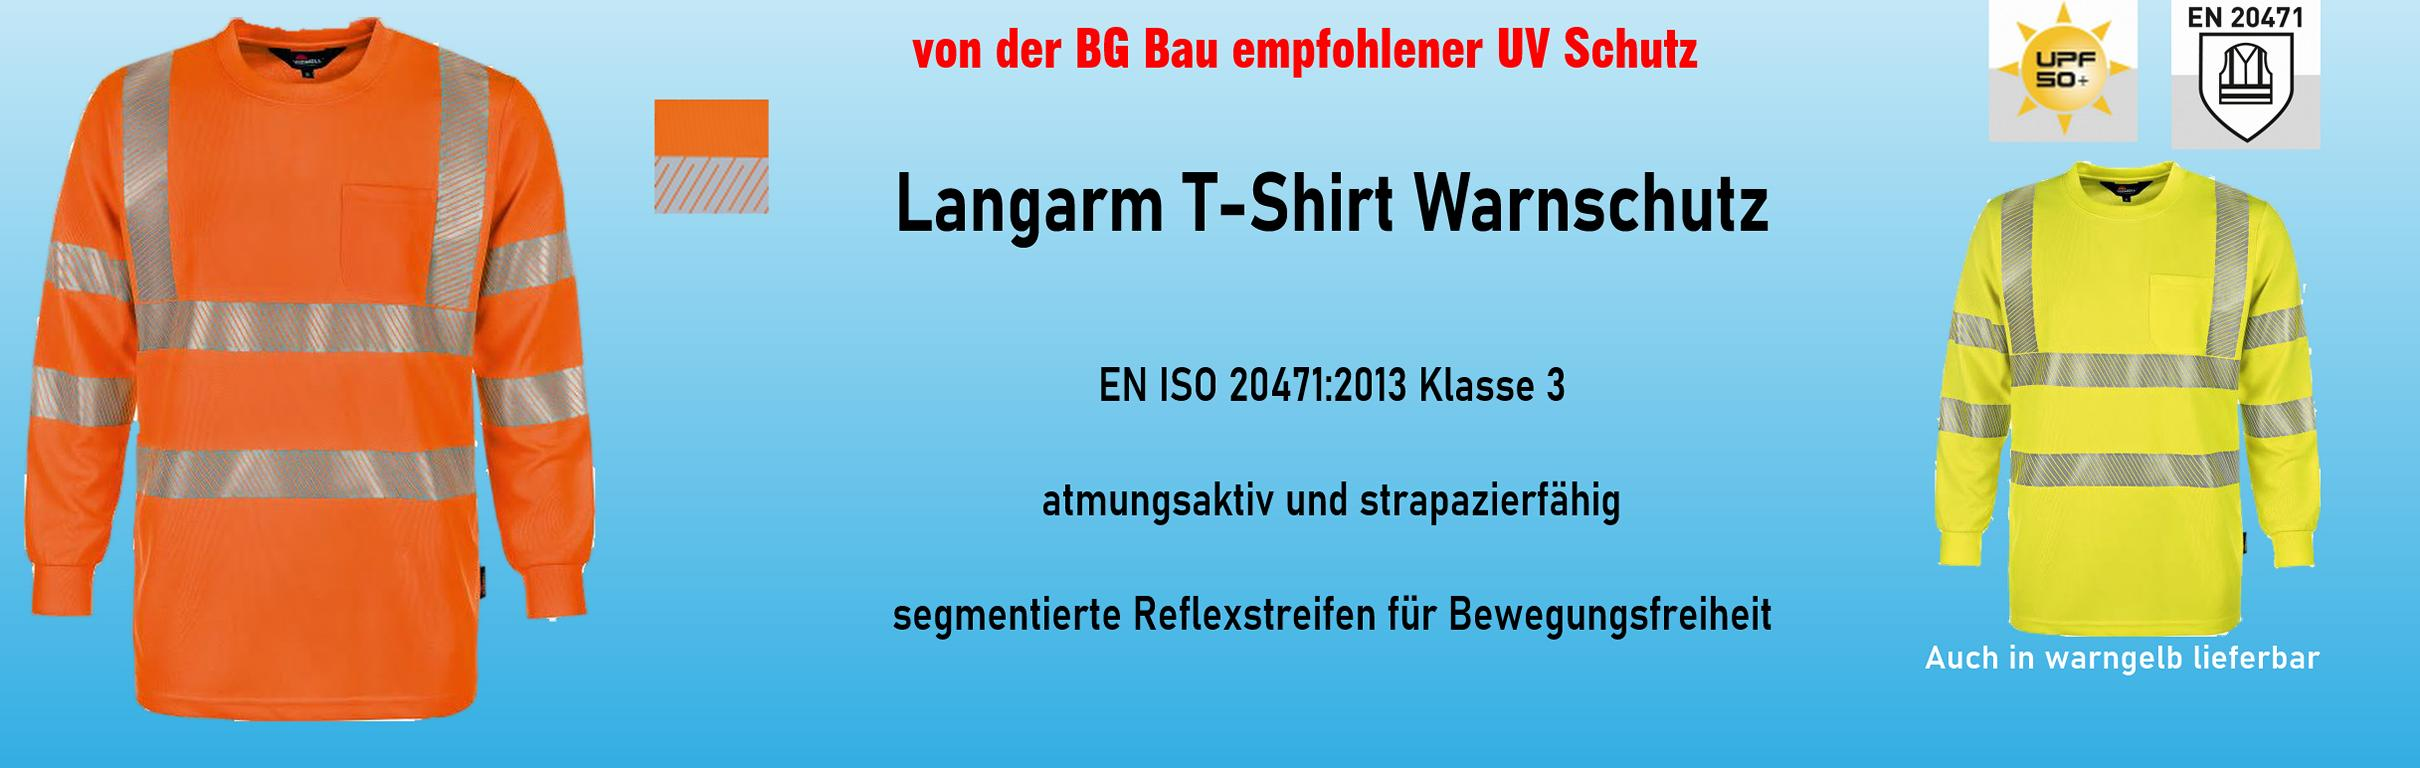 Warnschutz Langarm Shirt ab € 19,95